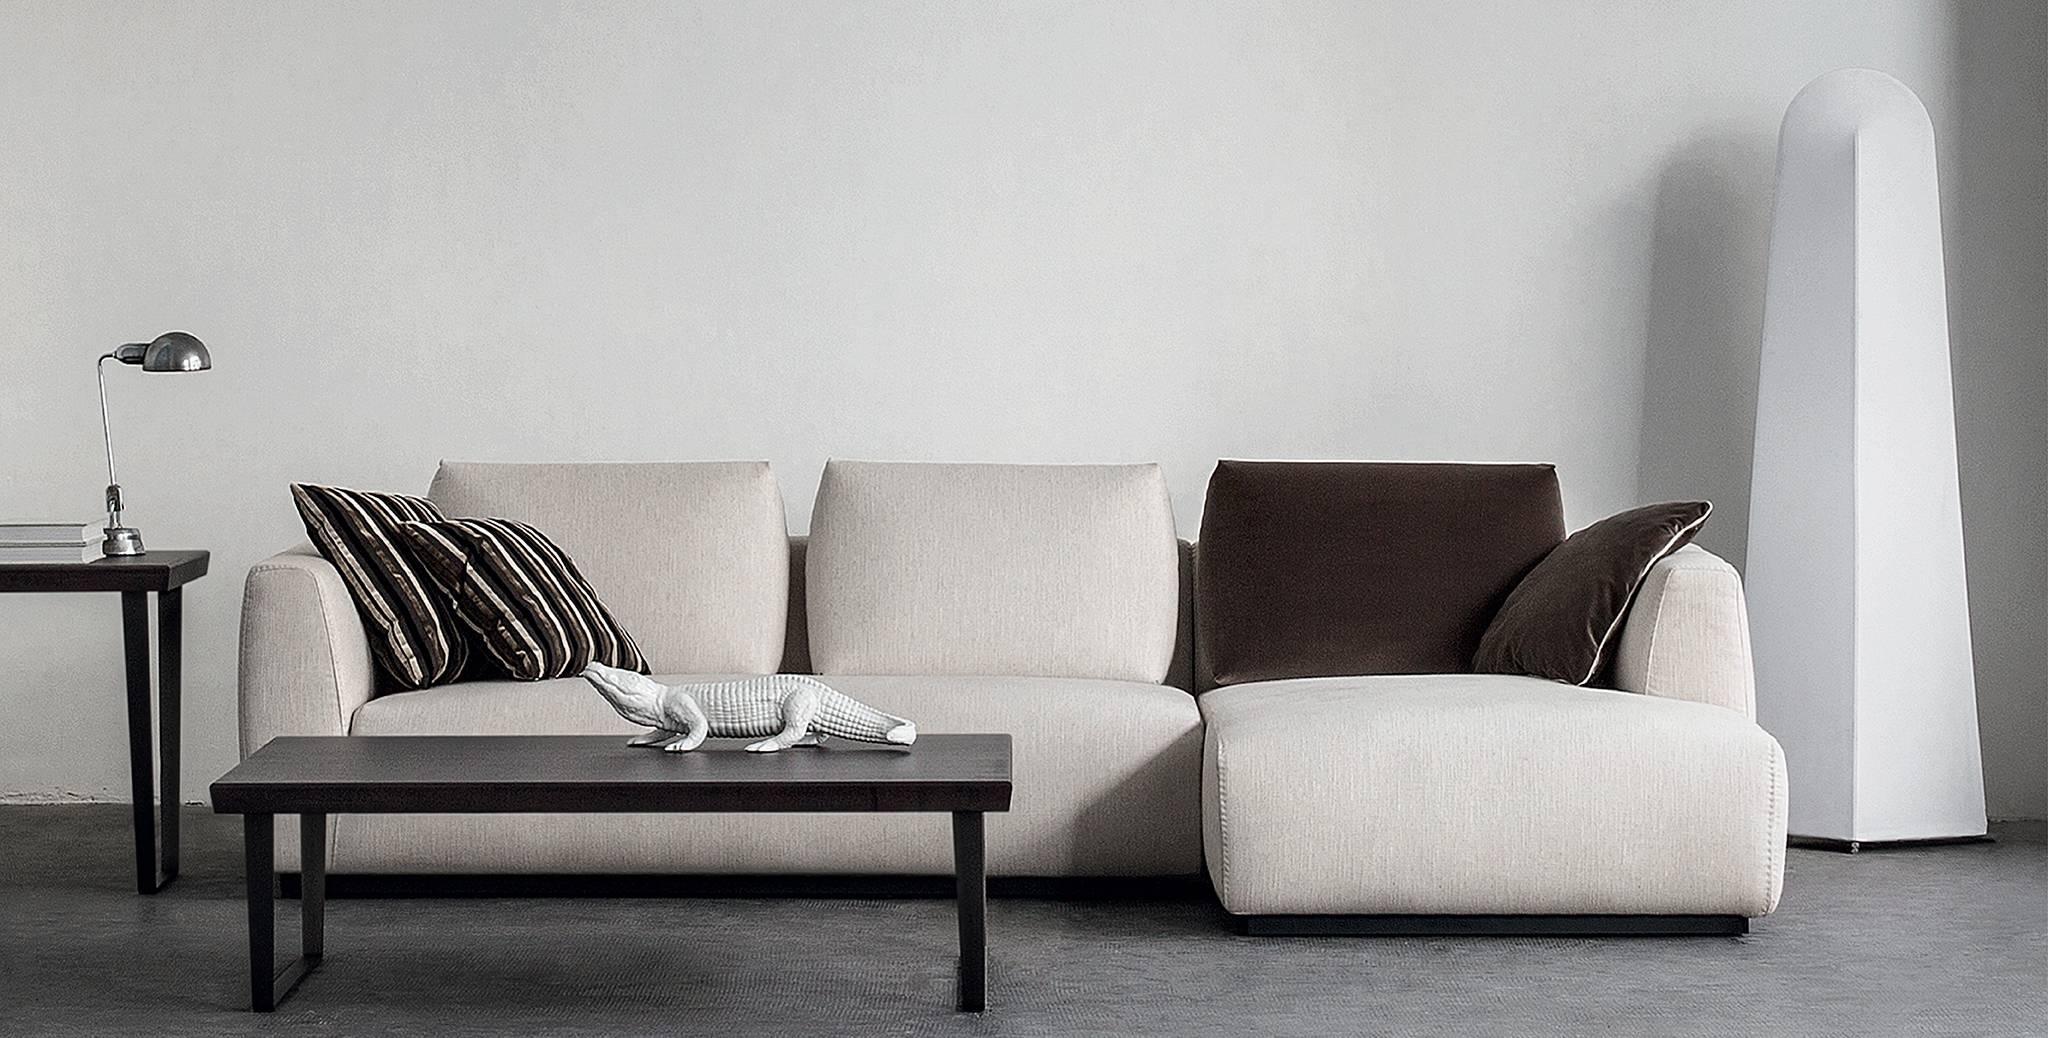 Modern Sofa Italian Design Oueiodexis Bedsandmattresses Store